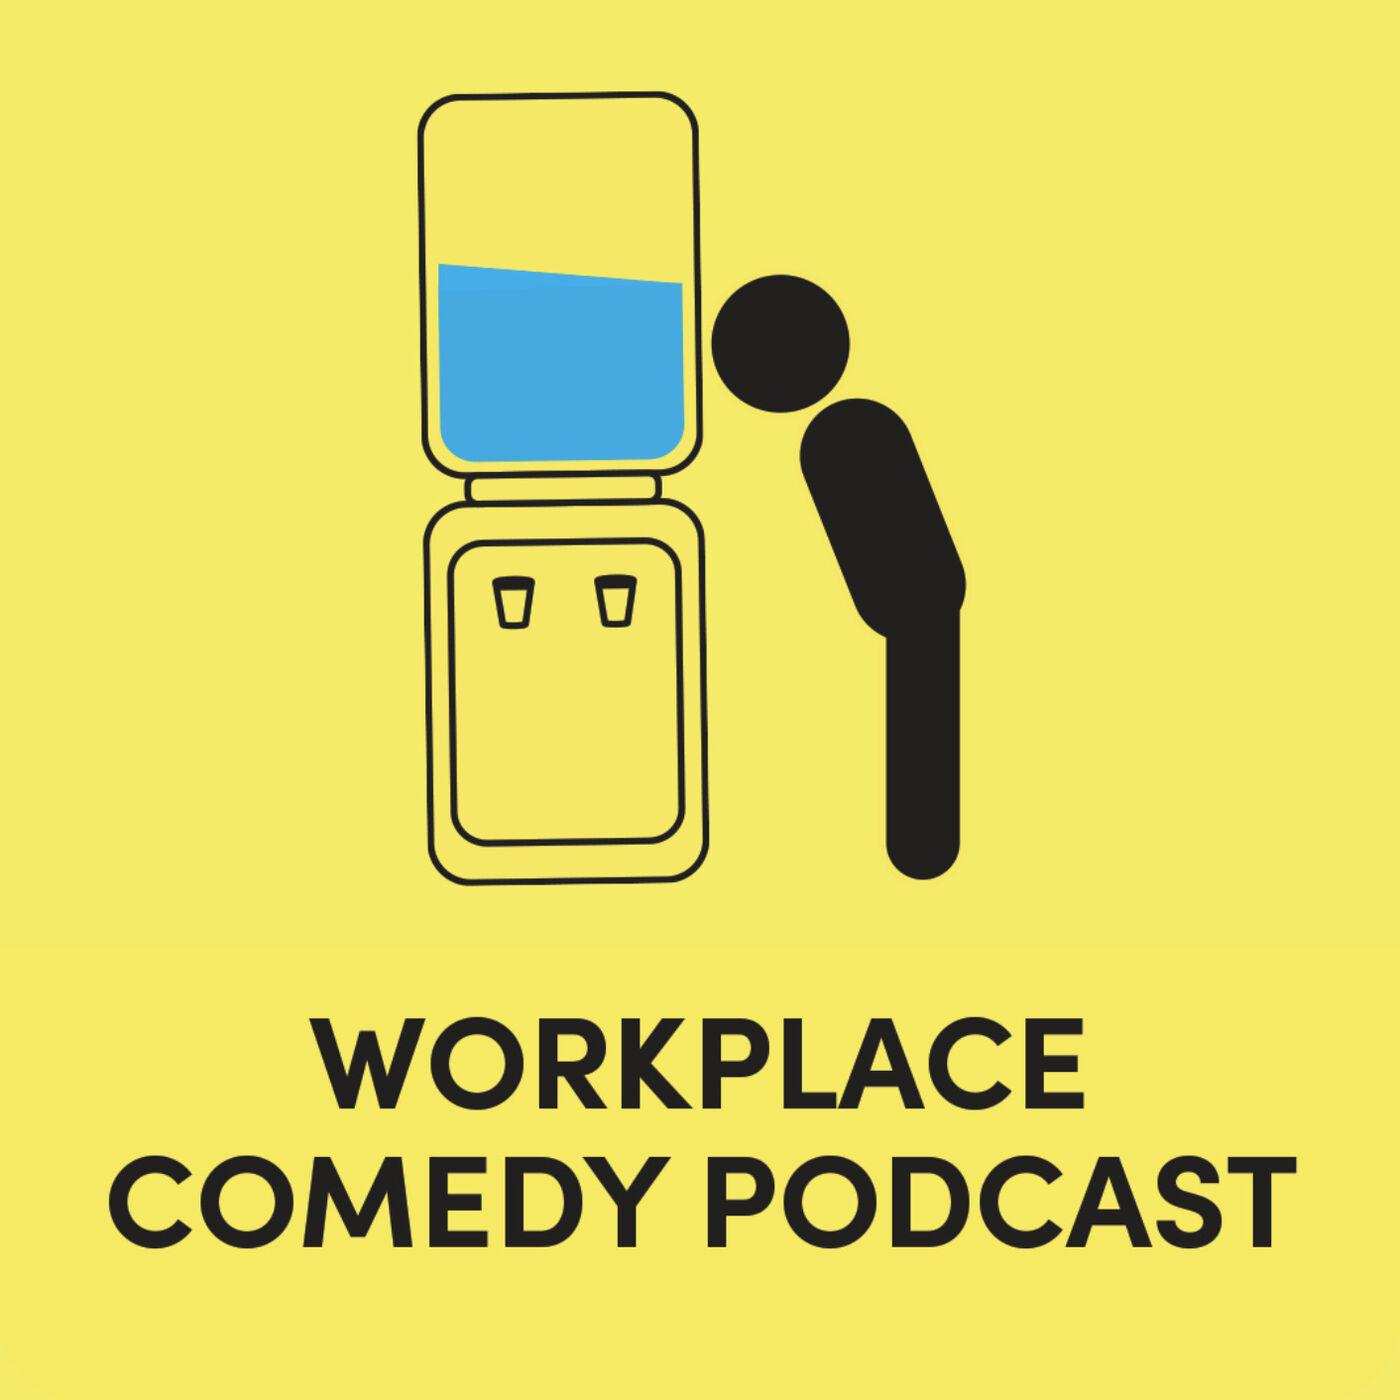 Workplace Comedy